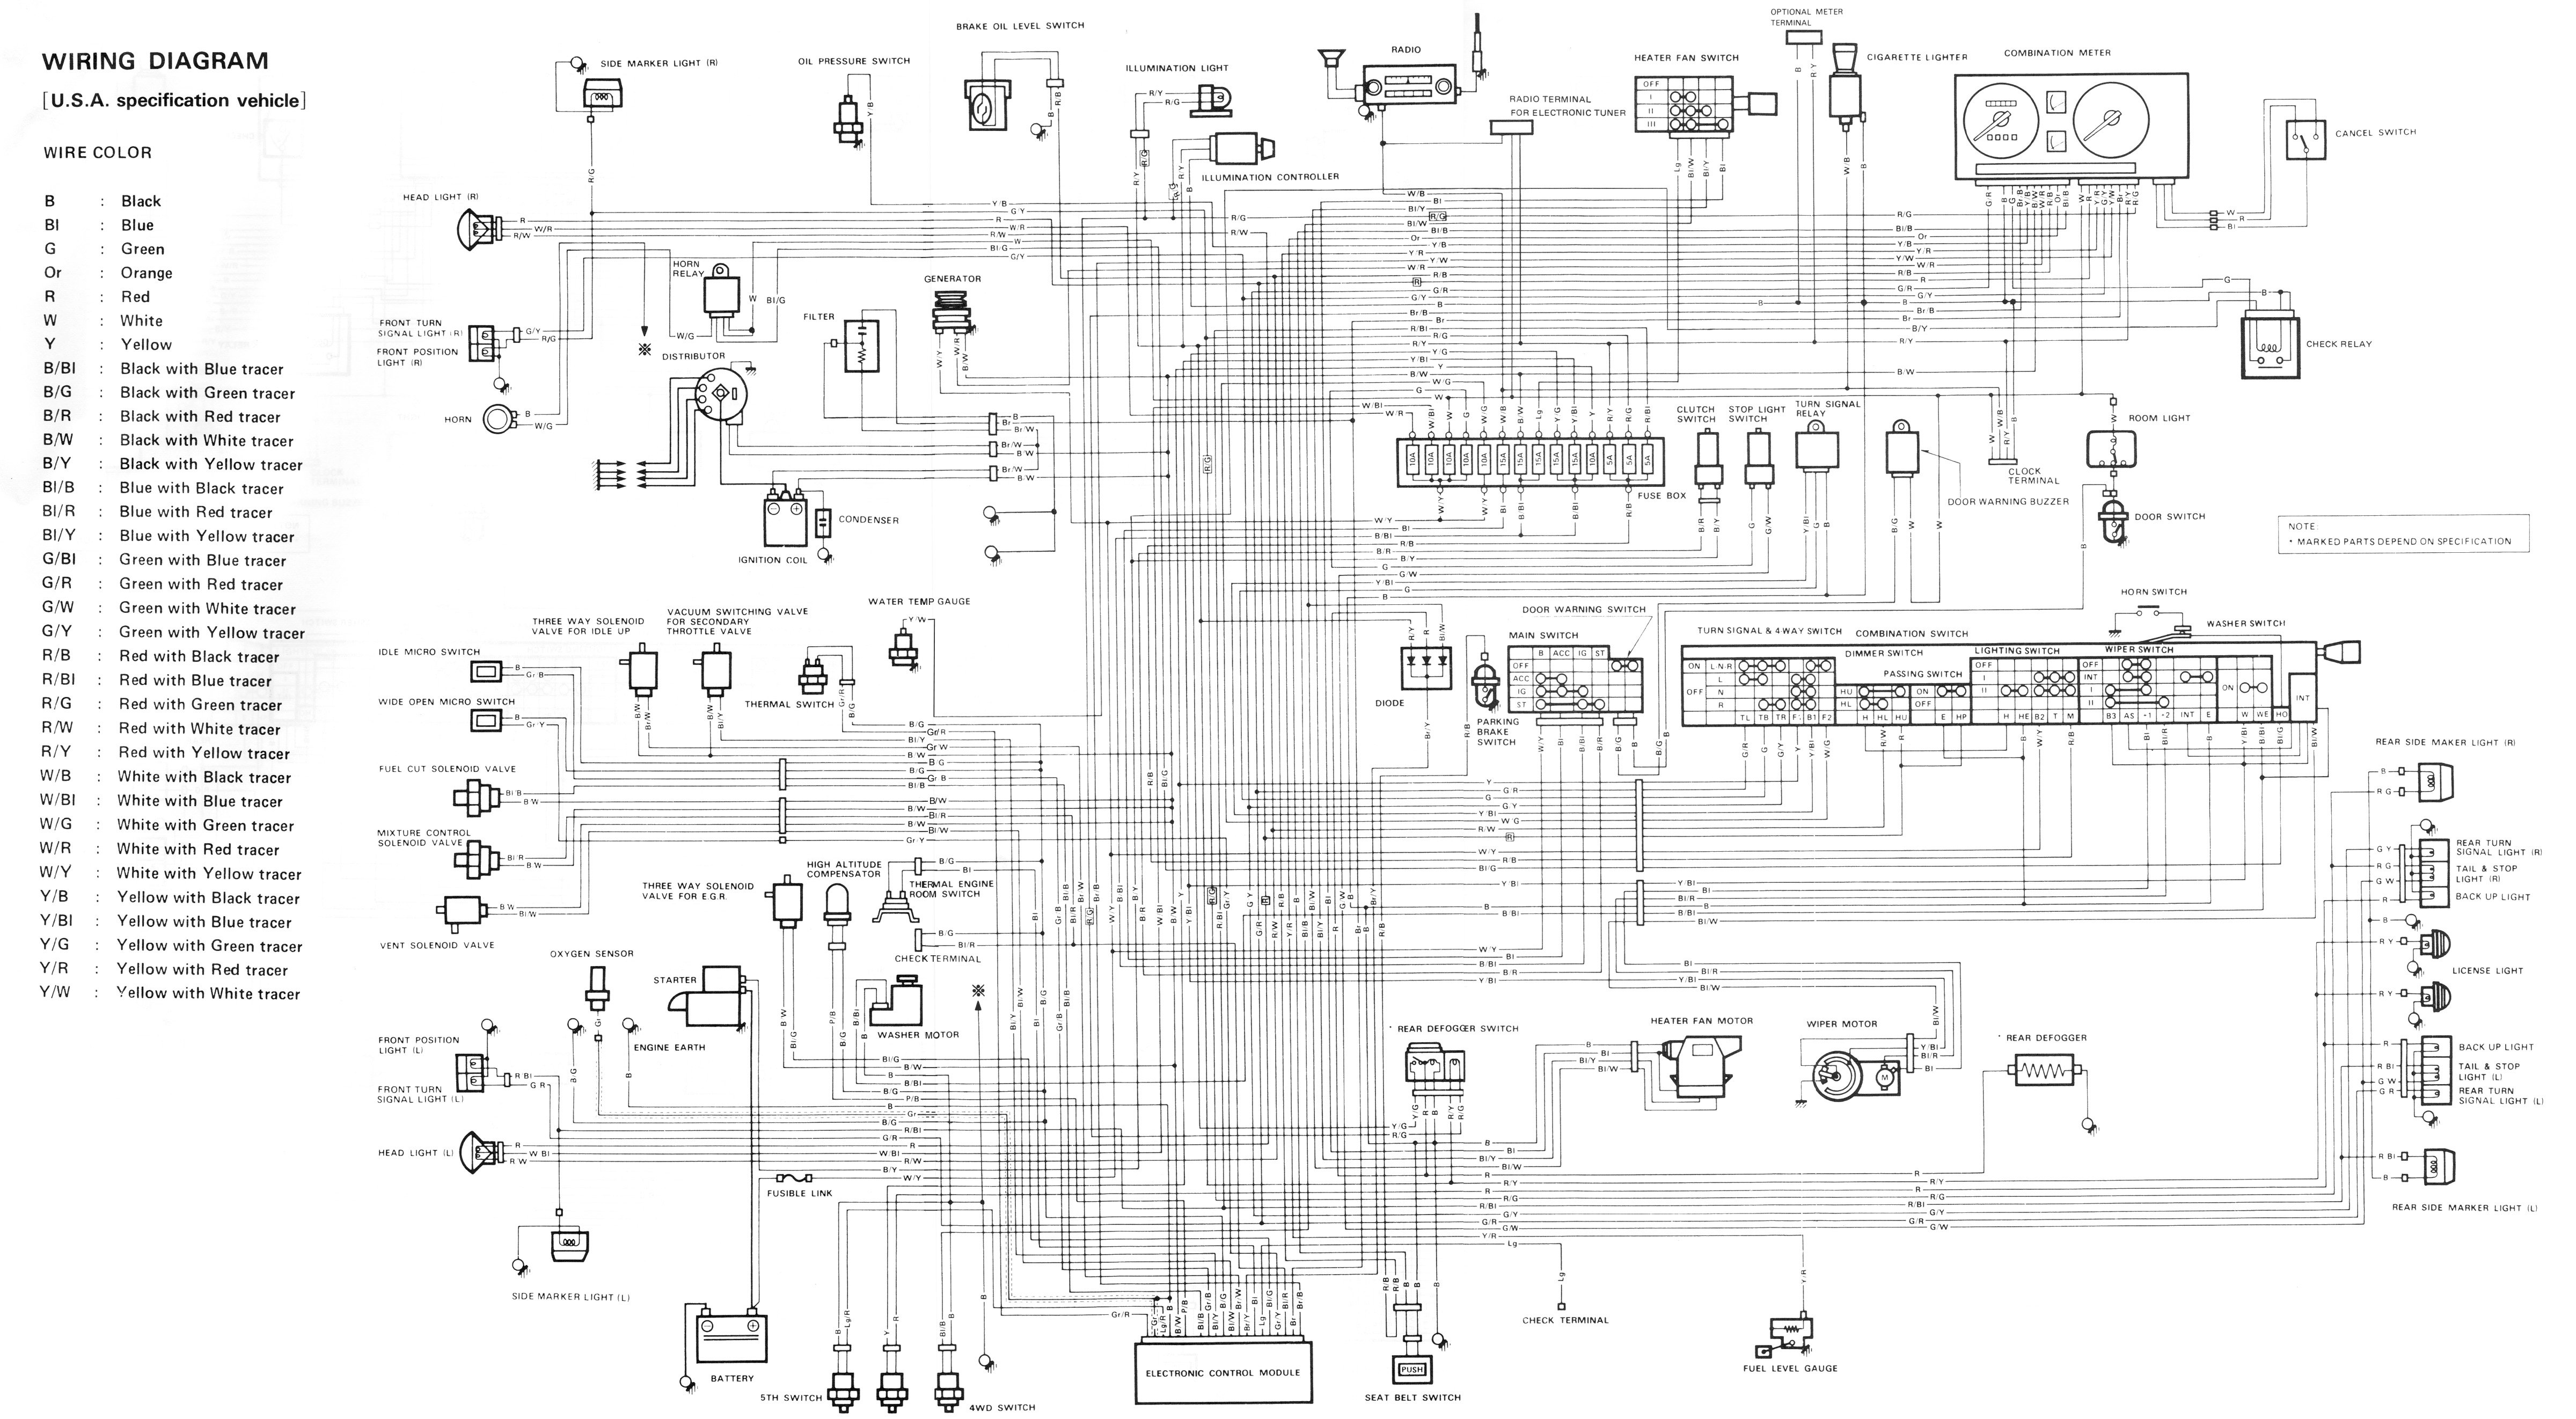 100 Suzuki Swift 2006 Repair Manual